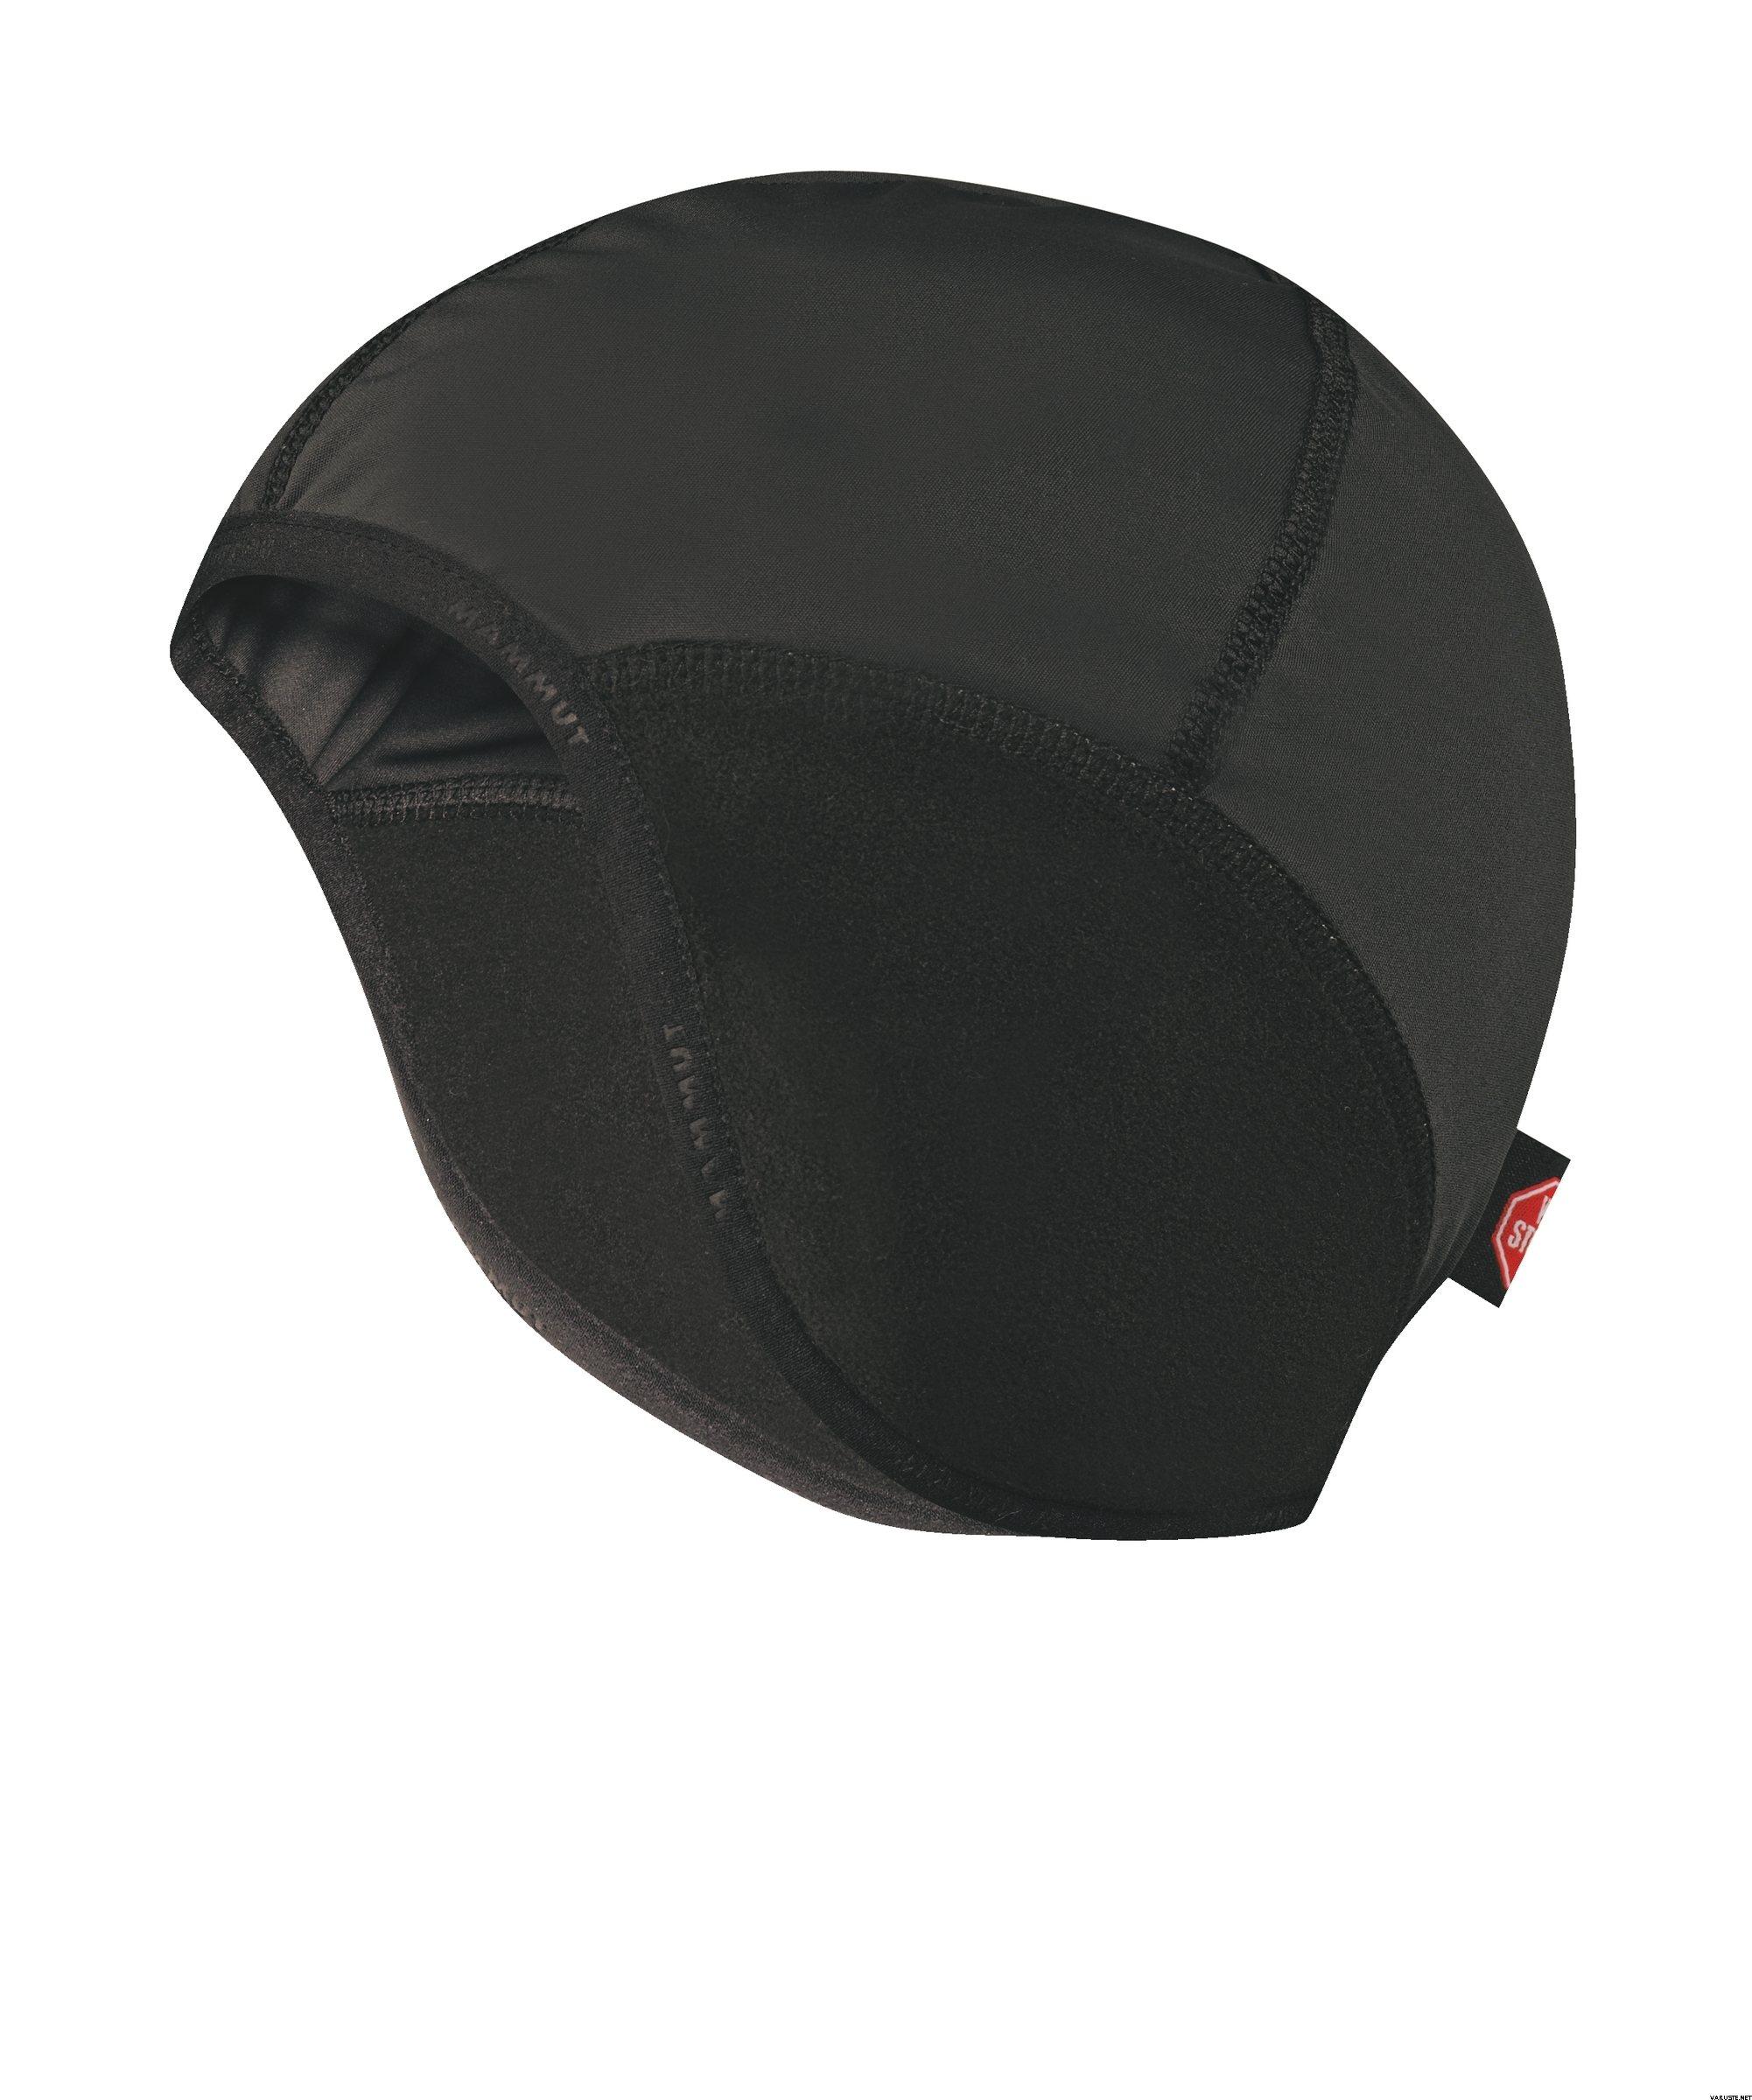 Ben-gi 100PCS Negro pl/ástico del Remache de Coches Fender Parachoques Push Pin Clips 10 mm Agujero de Repuesto para Toyota